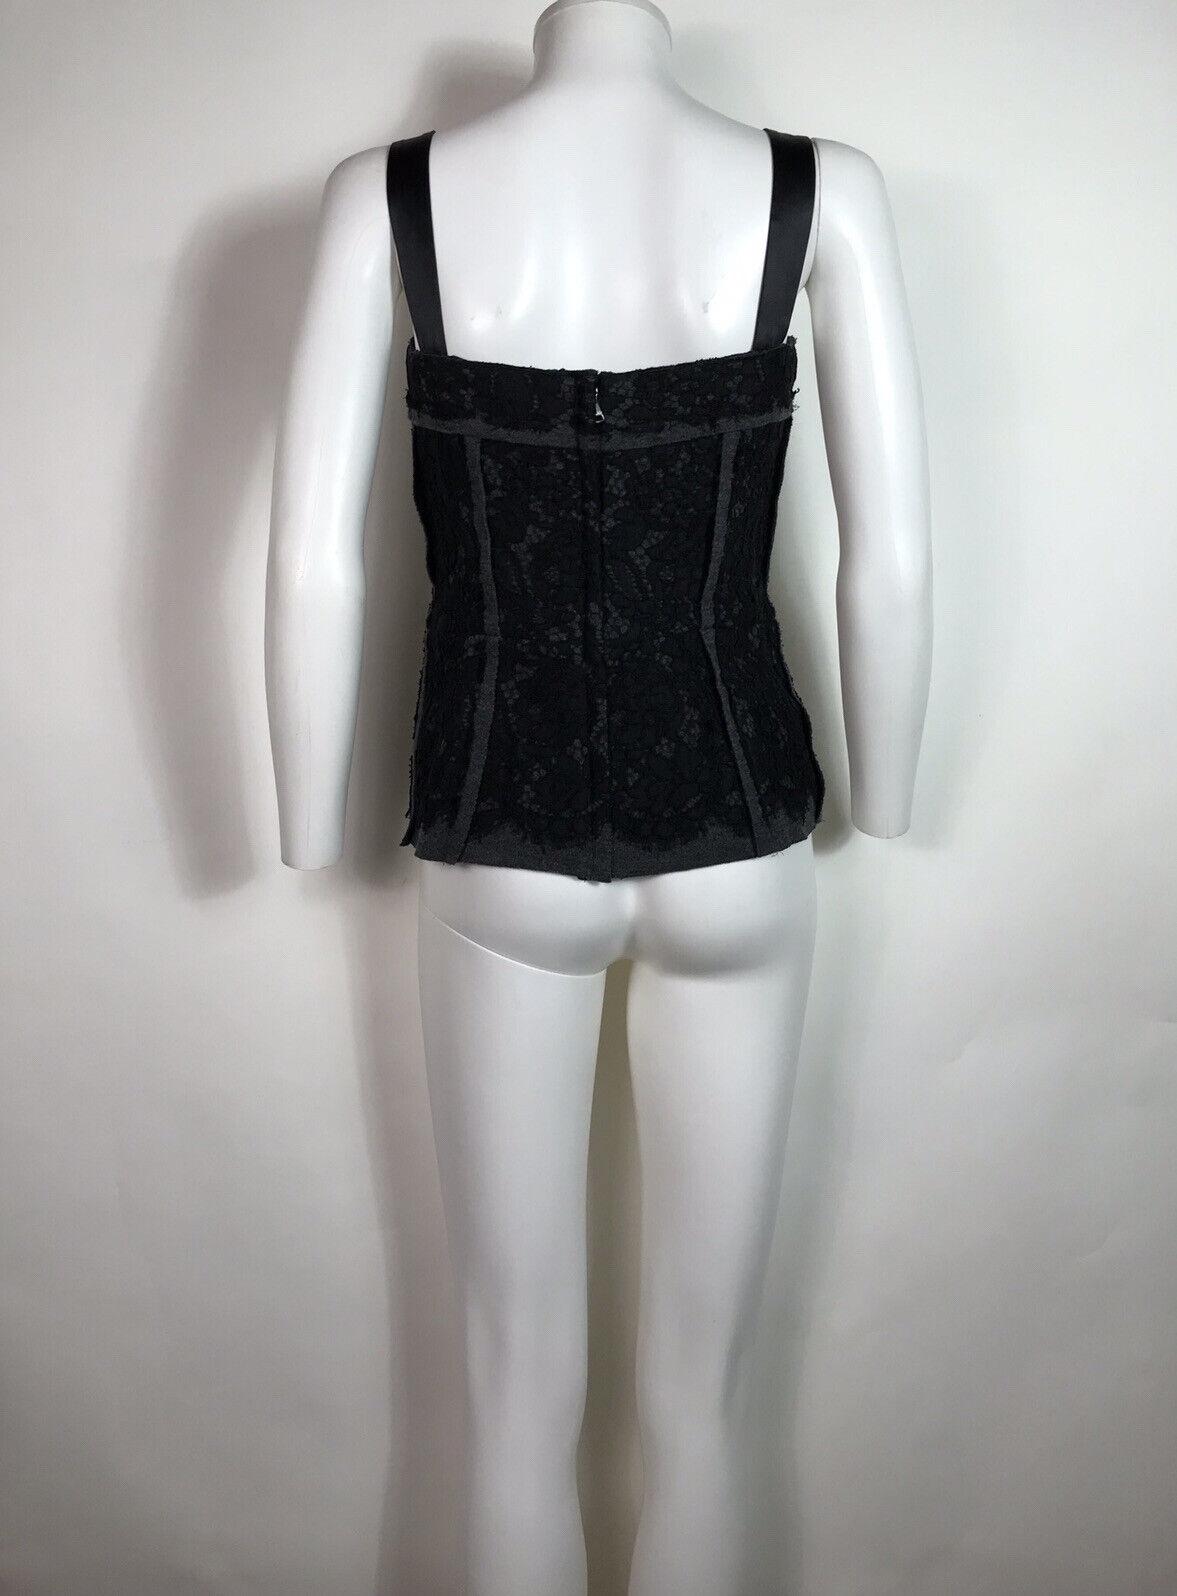 Rare Vtg Dolce & Gabbana Black Lace Corset Top L - image 5